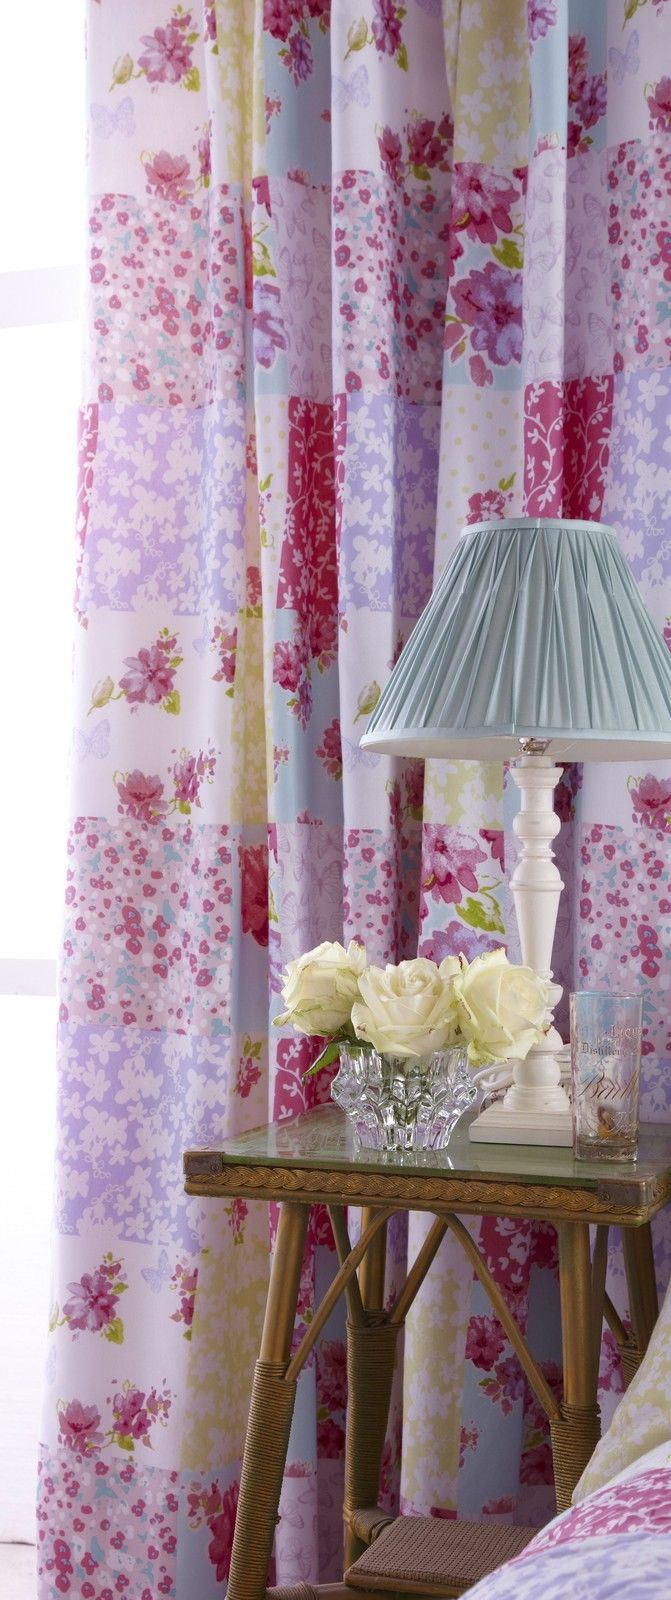 neue catherine lansfield zigeuner patchwork floral bunt. Black Bedroom Furniture Sets. Home Design Ideas